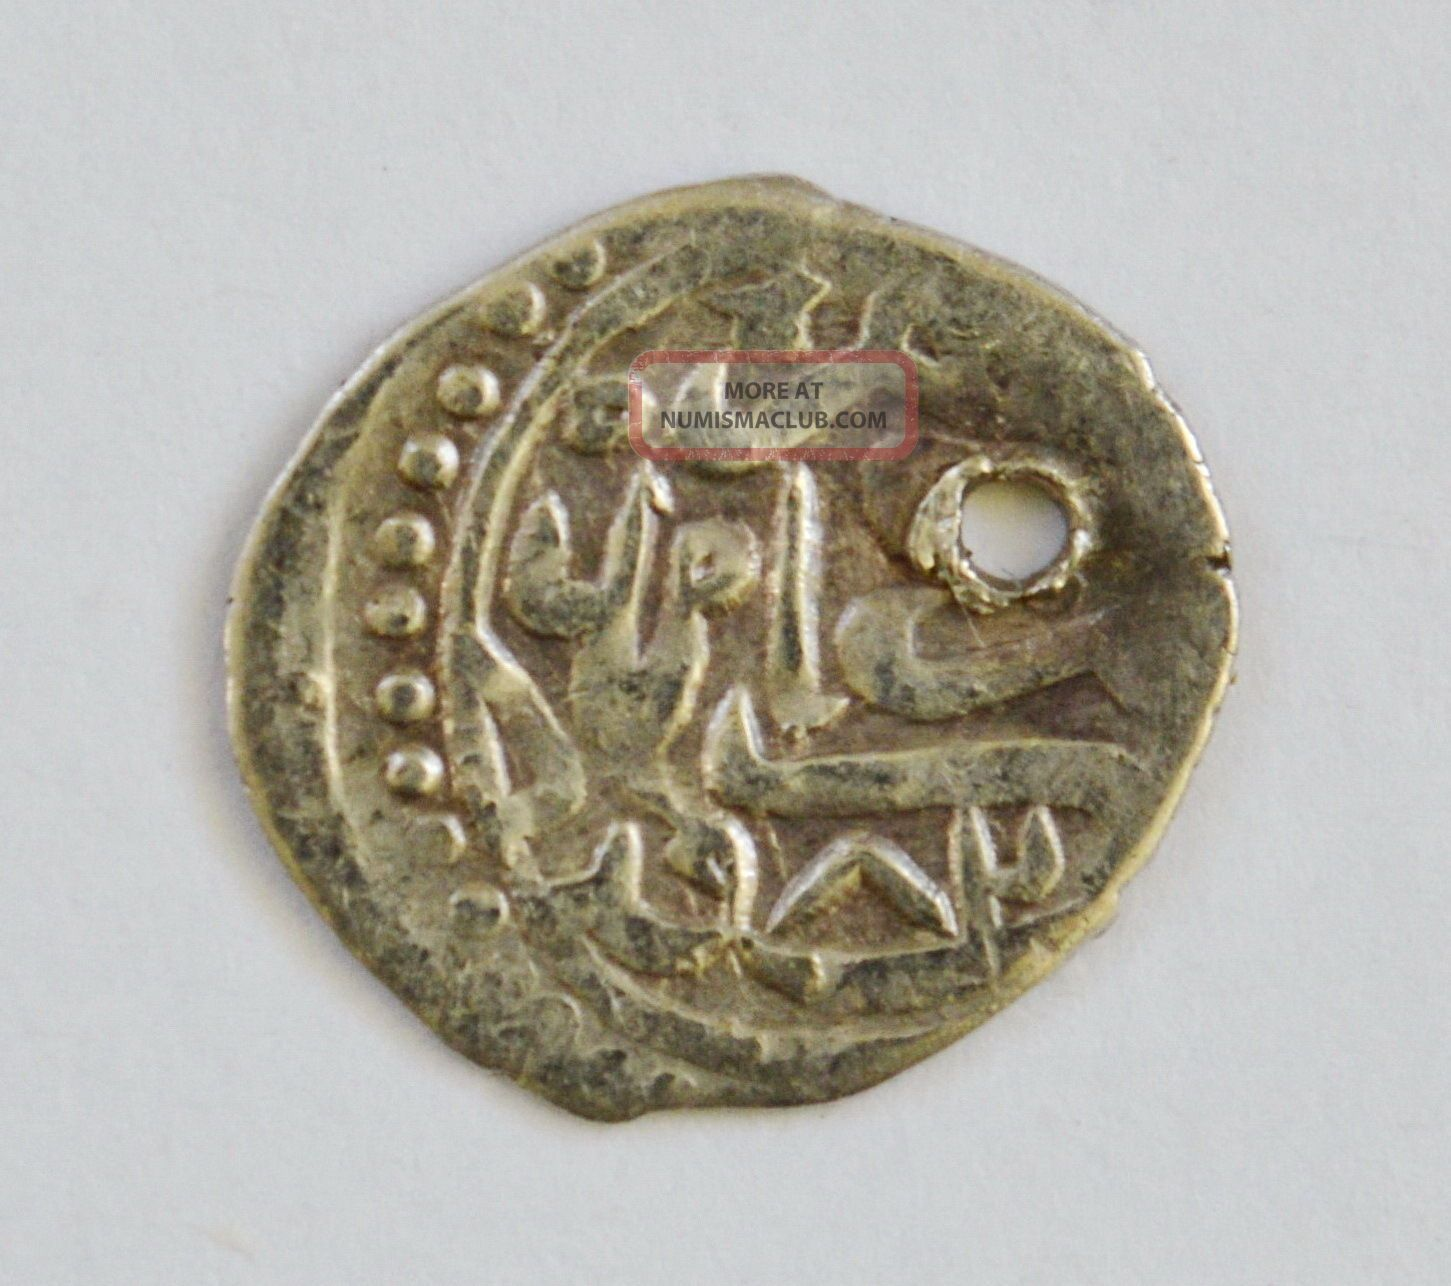 Ottoman Empire Akche 982 Ah Murad Iii Rare Islamic Silver Coin Struck In Amid Coins: Medieval photo